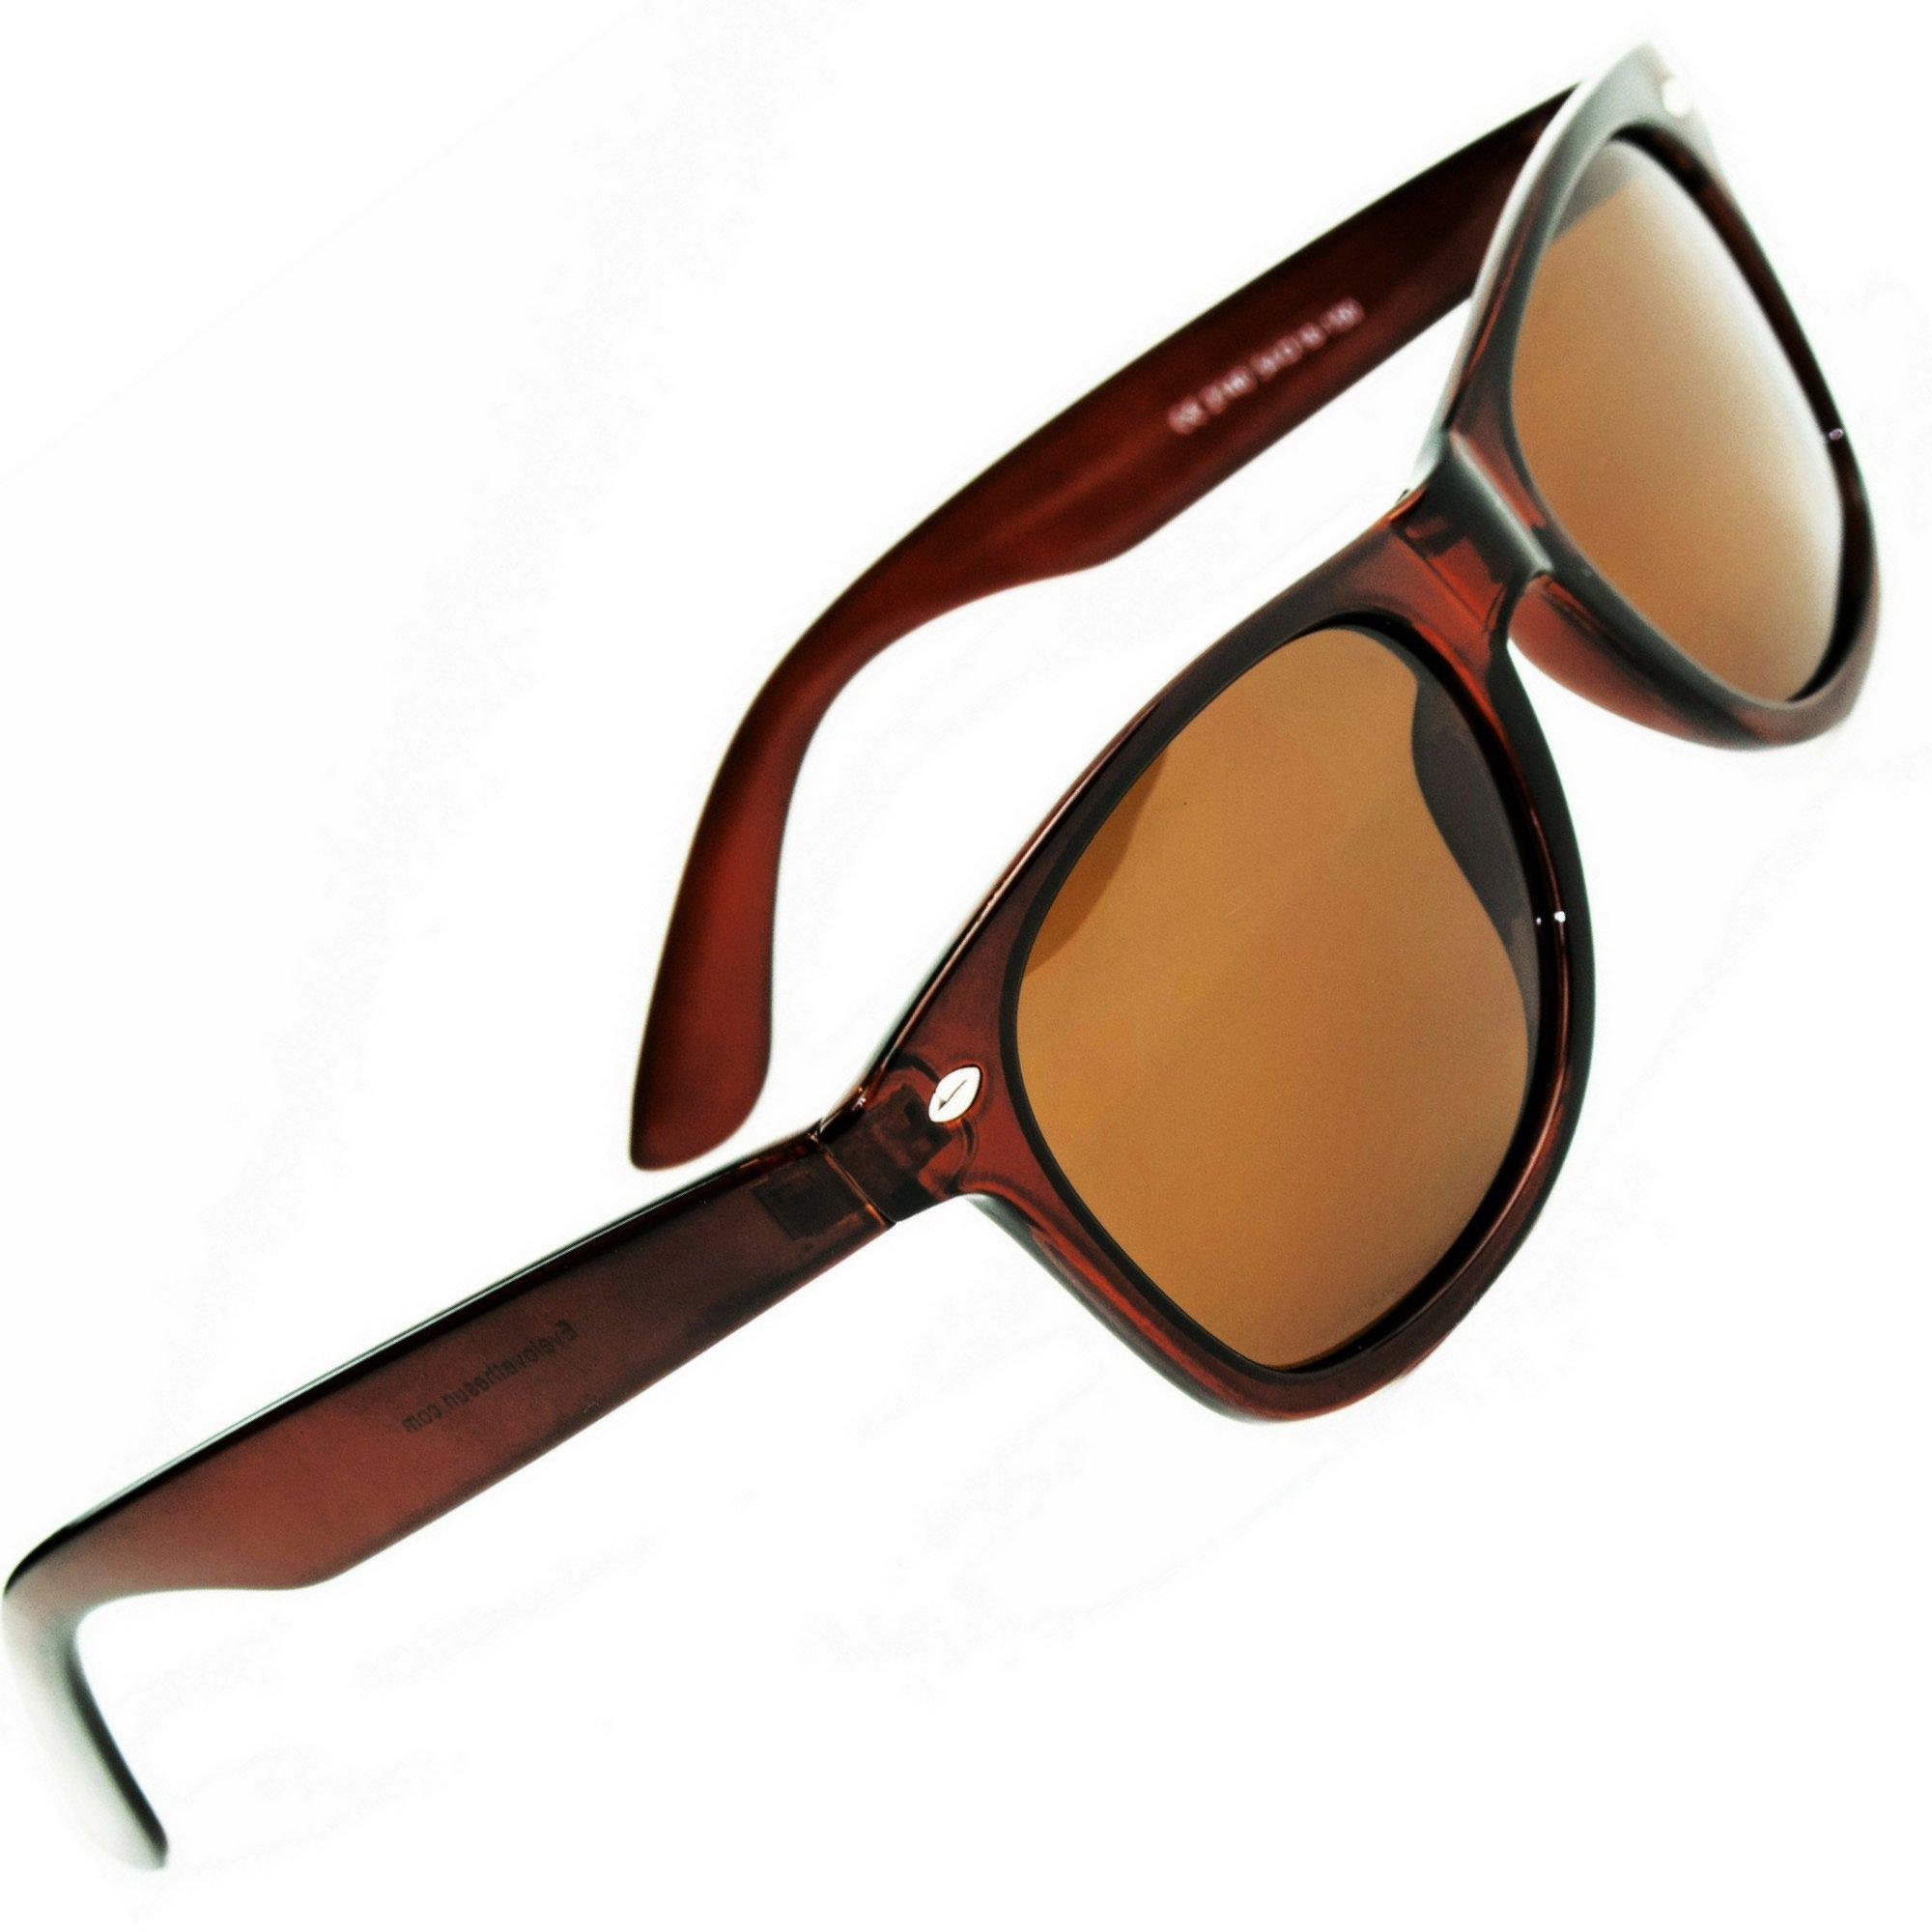 Eye Love Polarized Sunglasses for Men & Women   Glare-Free   100% UV Blocking   5+ COLORS (Glossy Brown Frame   Brown High Definition Polarized Lenses)